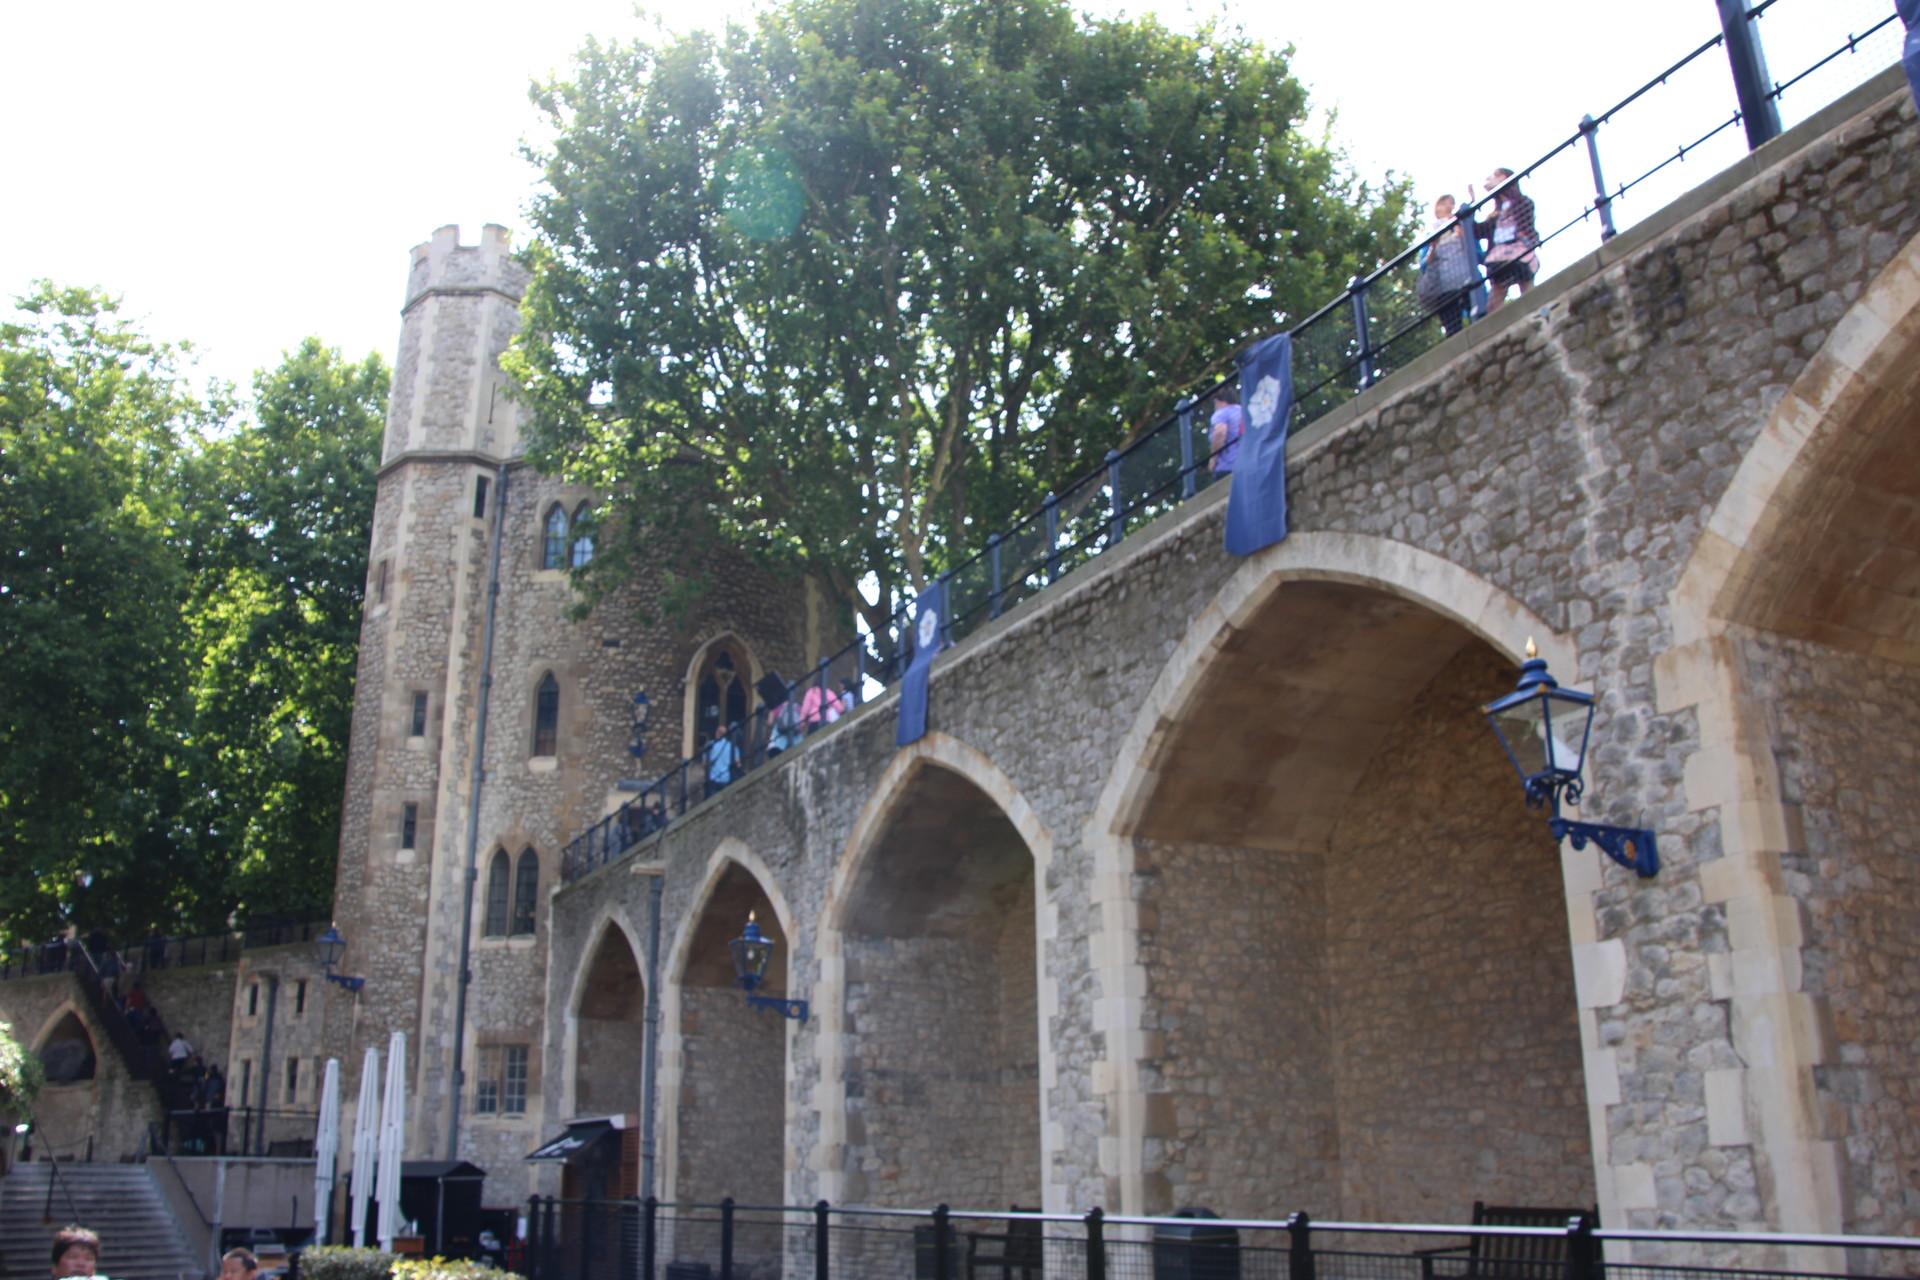 tower-of-london-la-torre-londres-9670e9b